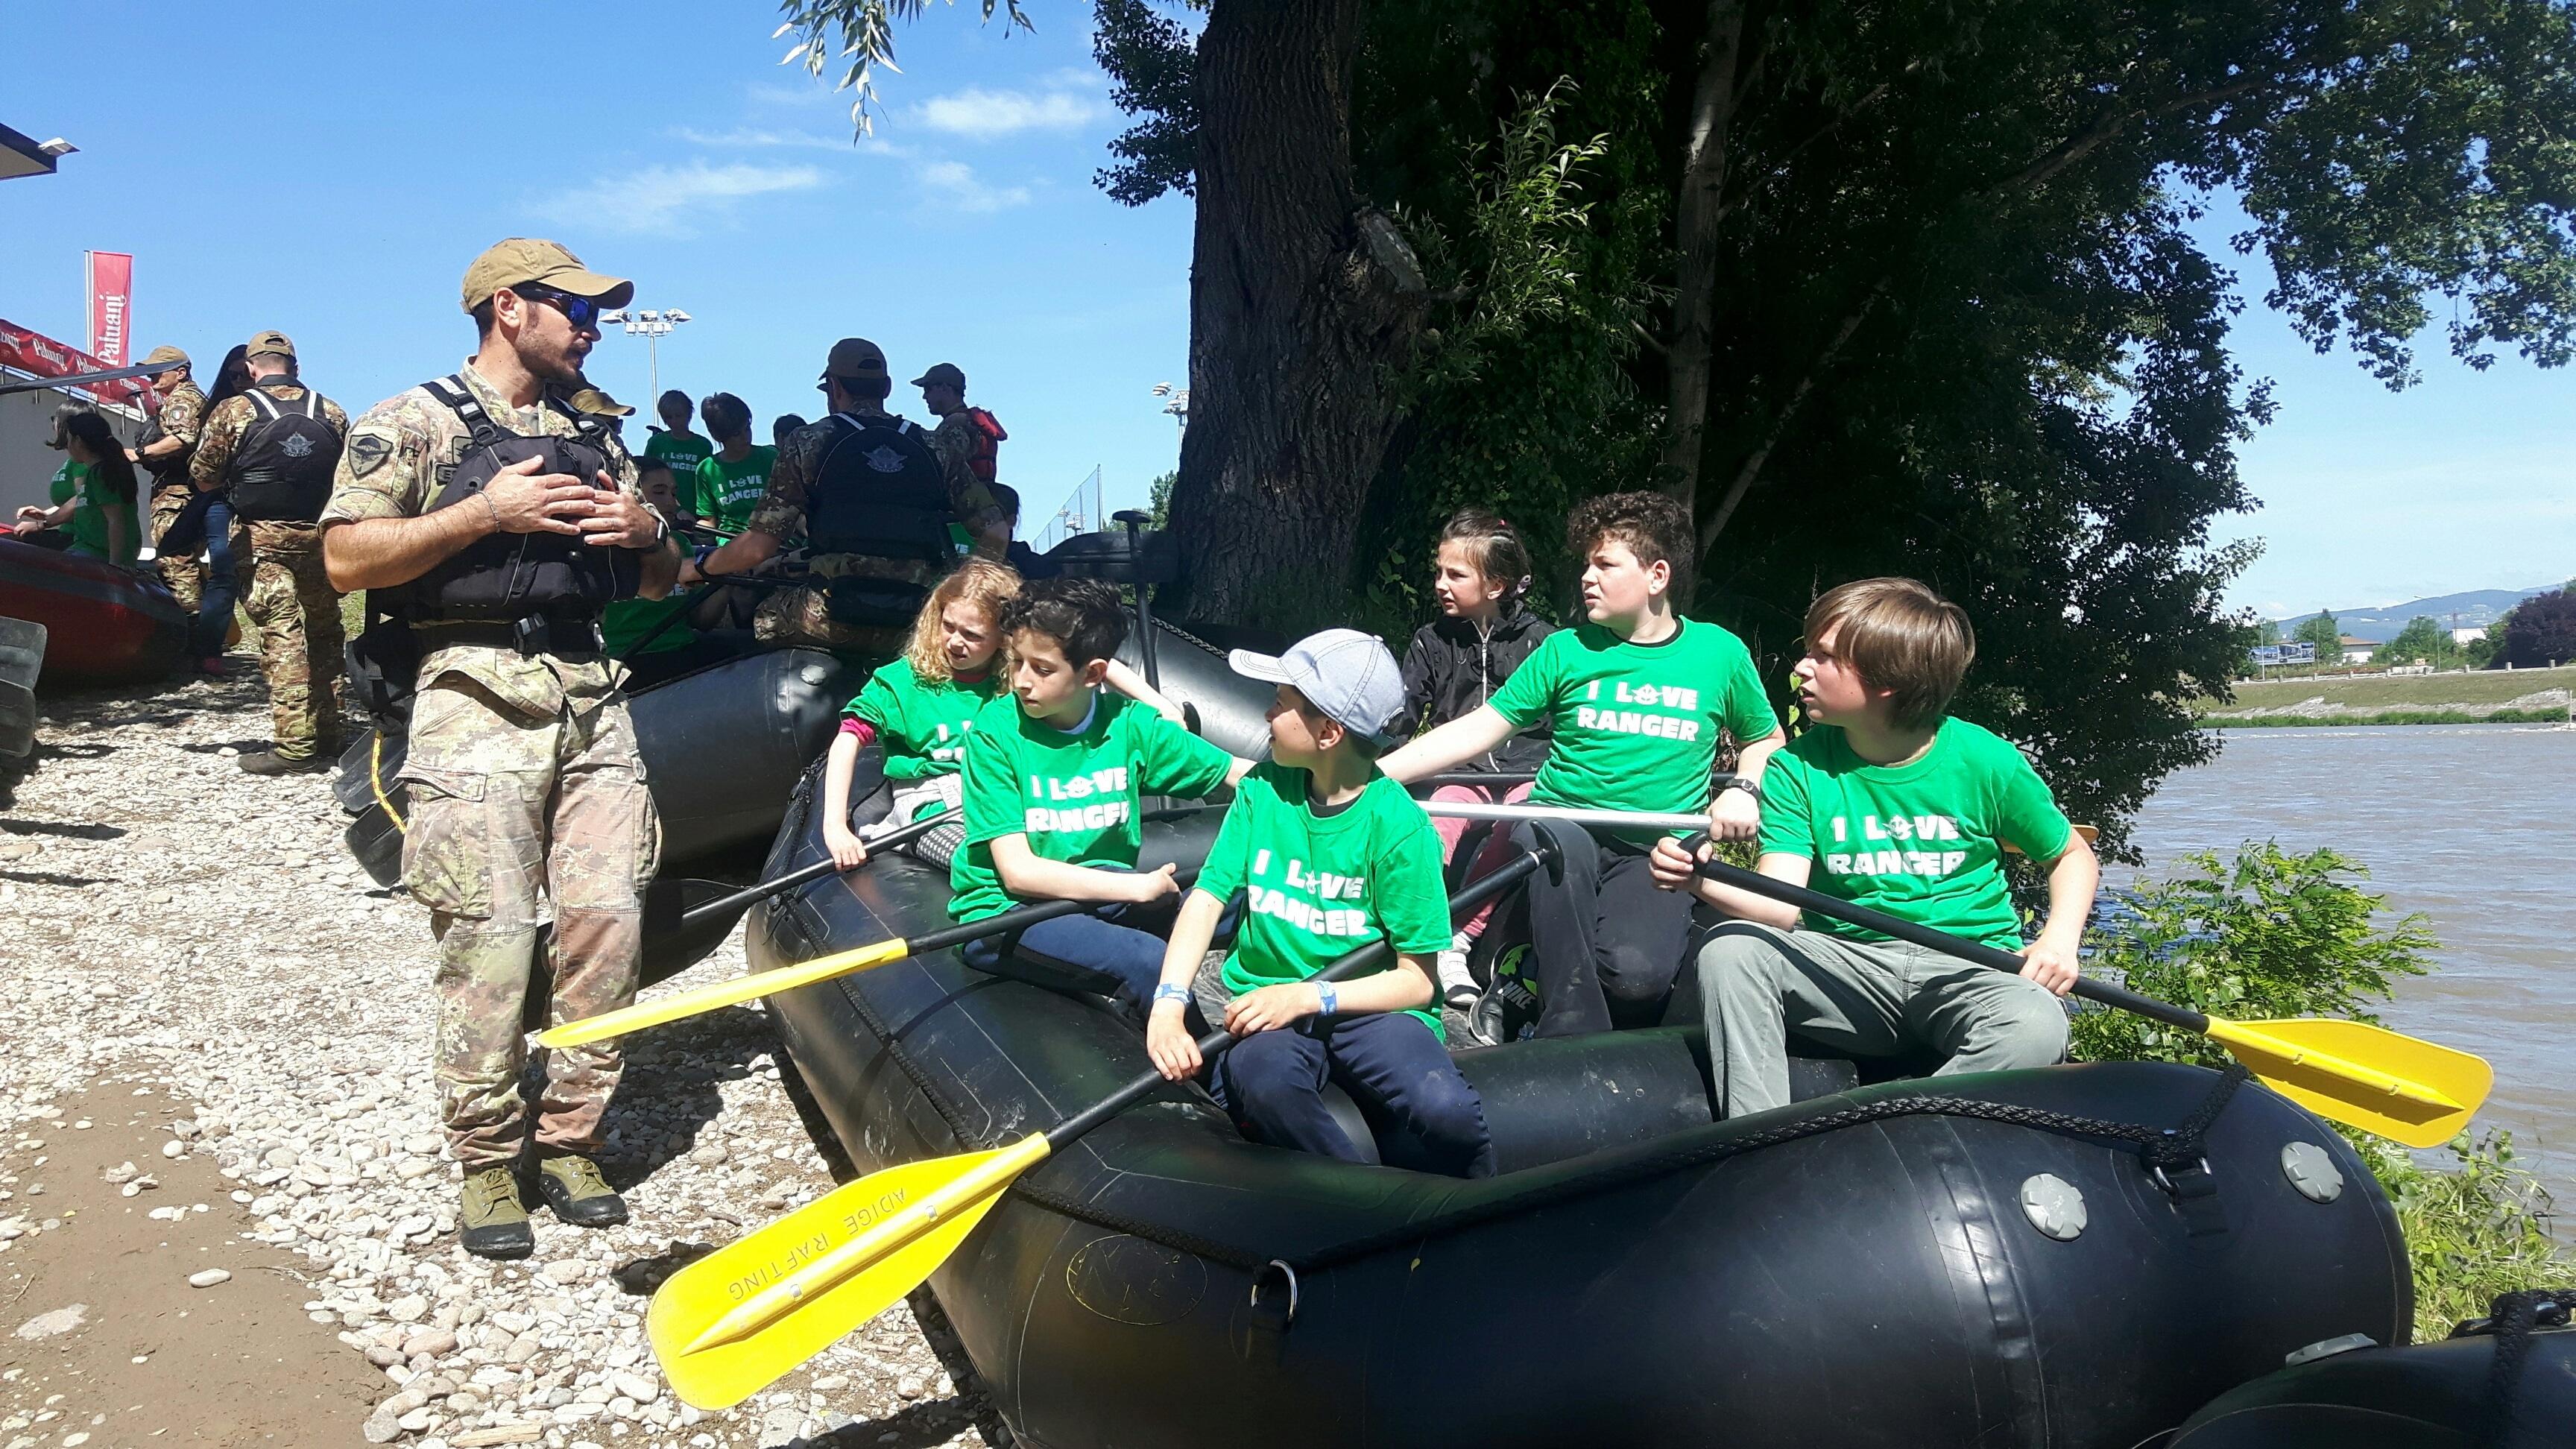 rafting bimbi e ranger partenza-2